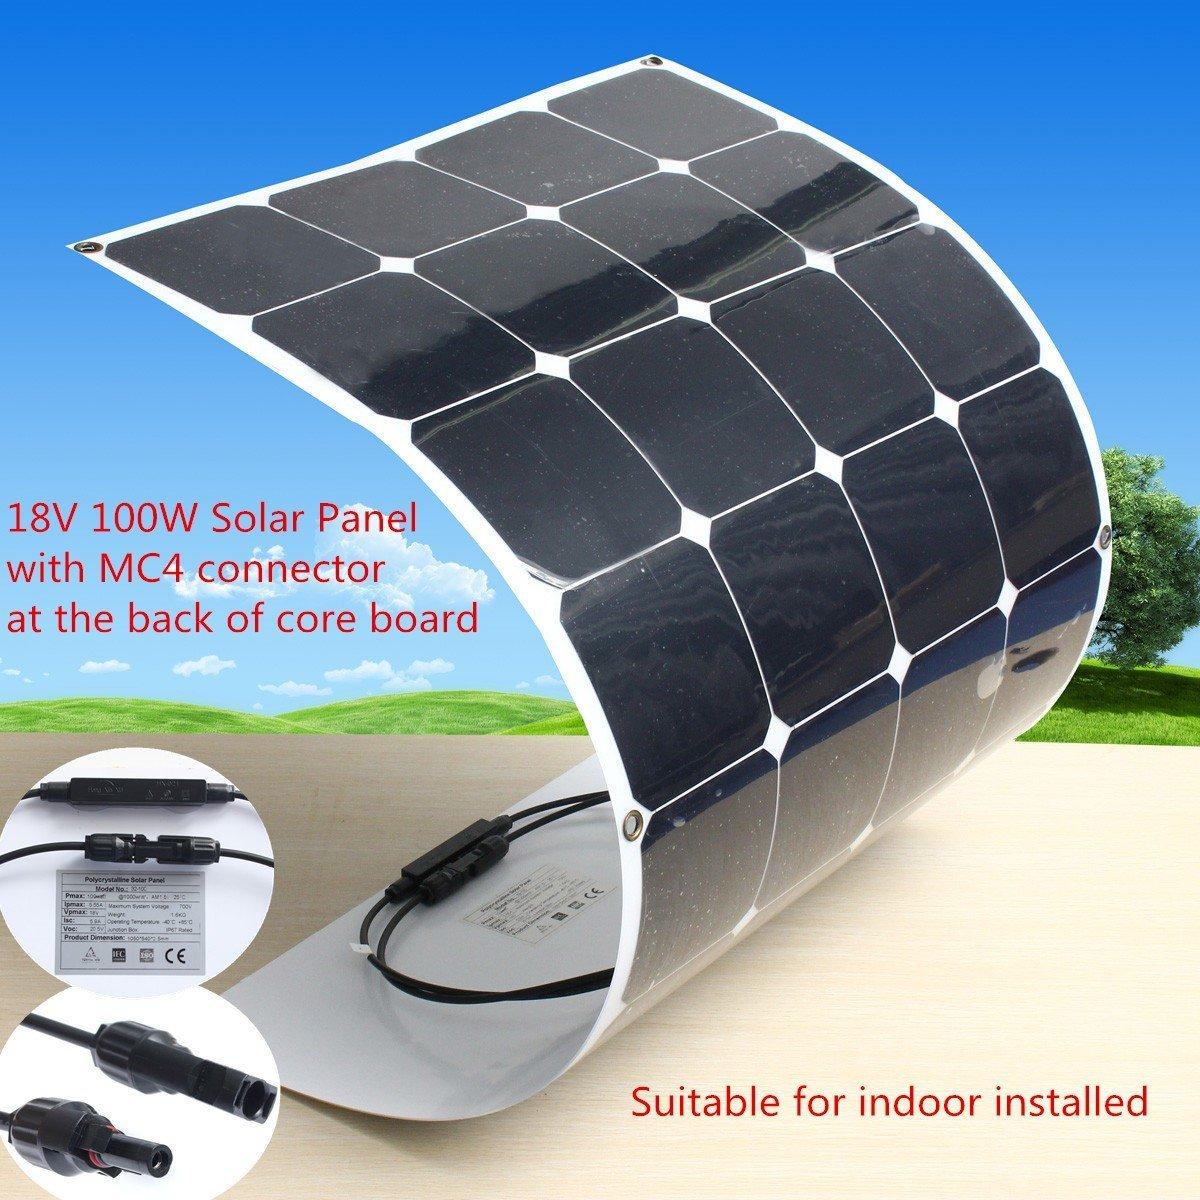 Mohoo 100W 18V Monokristalline Solarpanel Energie Semi Flexible Wasserdicht Ladegerät Panel-Abenteuer Auto RV Boot + 1,5 m Kabel